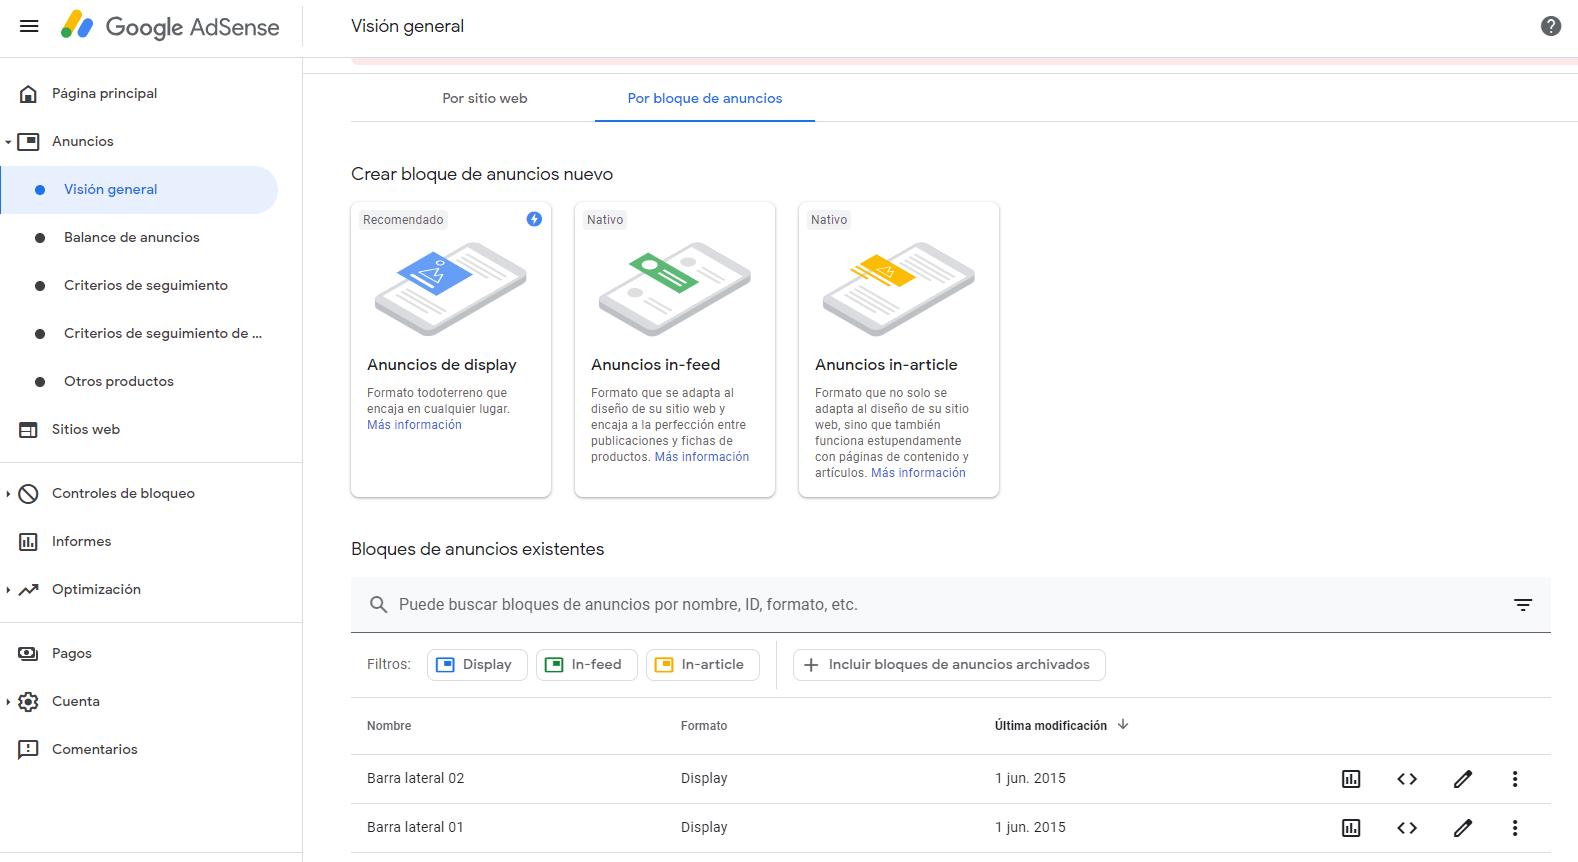 Insertar Google Adsense en WordPress. Insertar Google Adsense en WordPress. Crear anuncios en Google Adsense